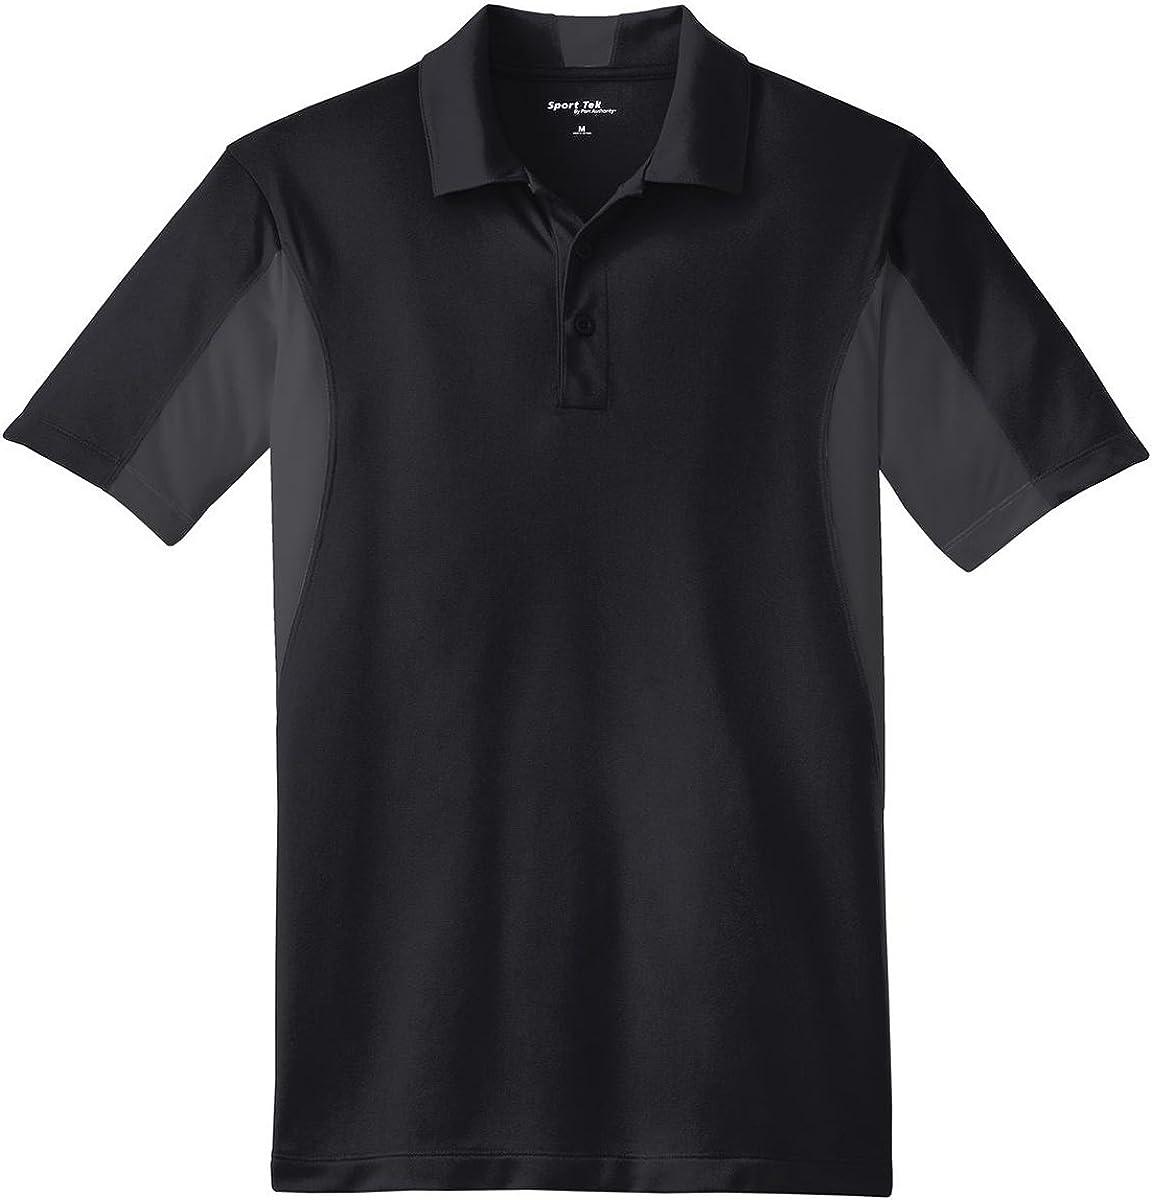 Sport-Tek Men's Big And Tall Performance Polo Shirt_Black/ Iron Grey_2XLT